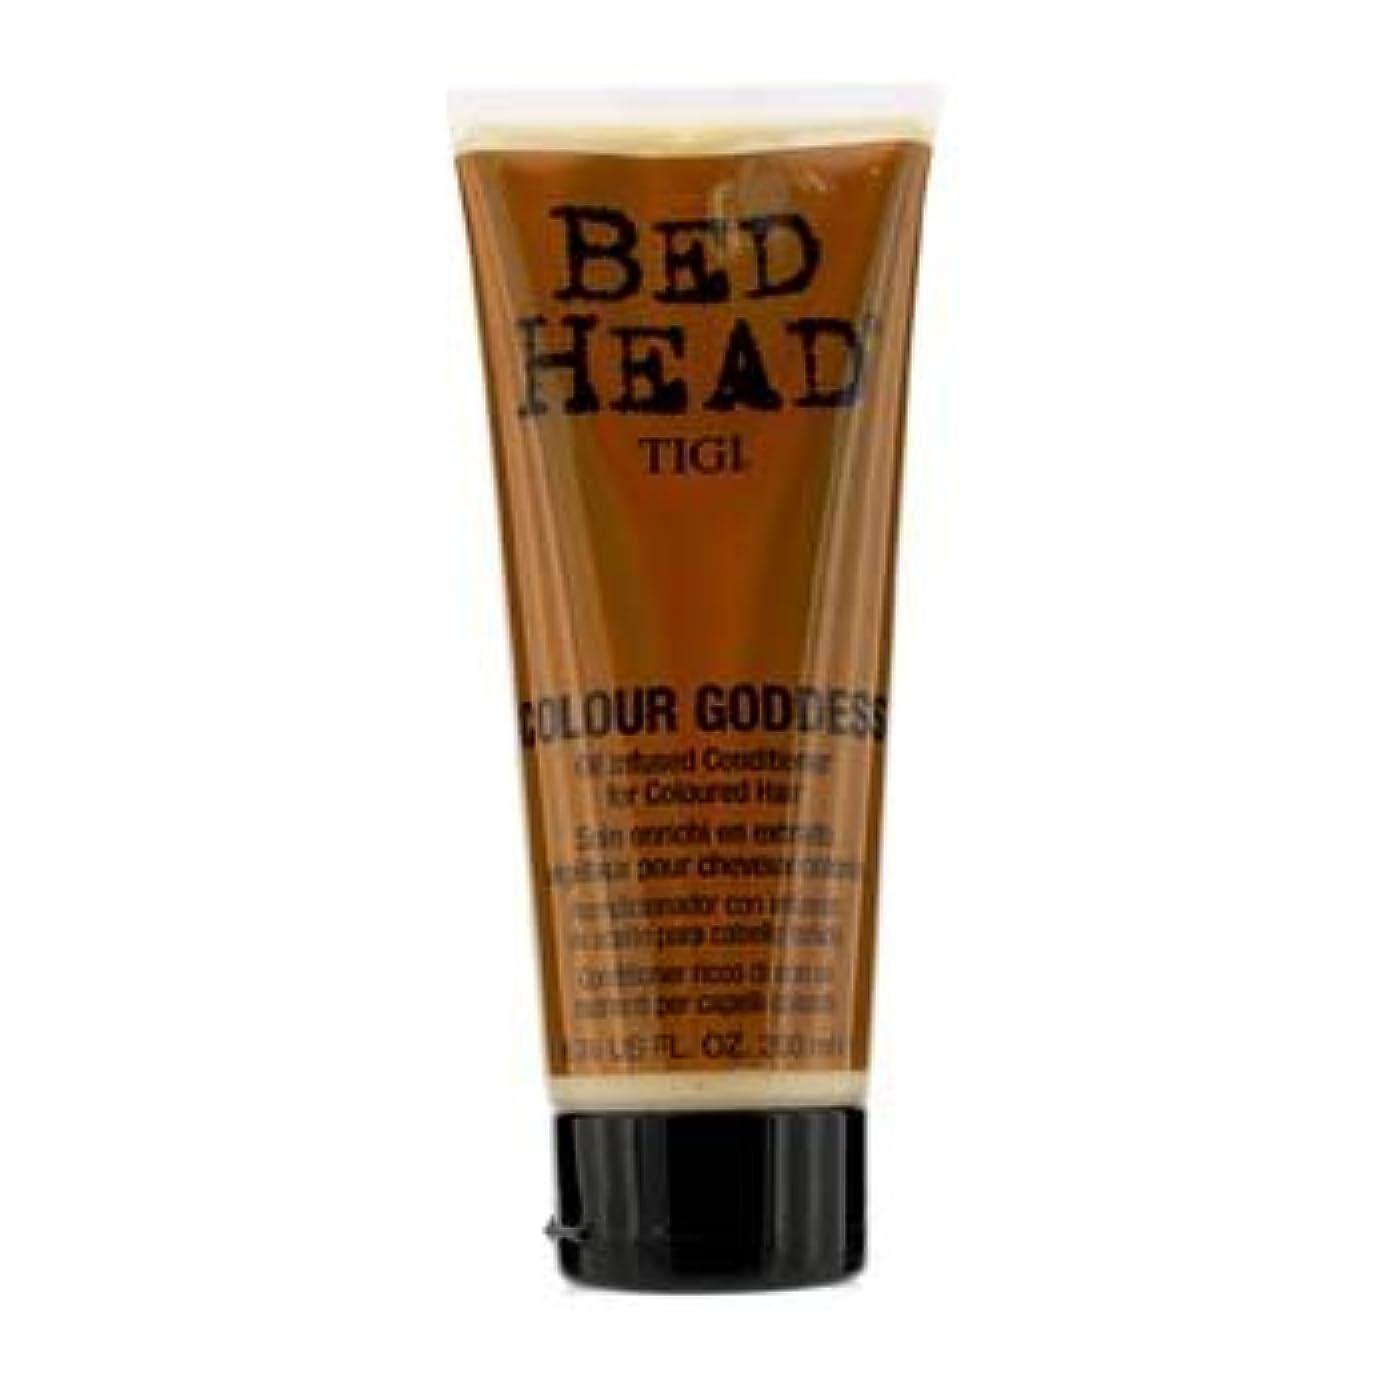 Tigi Bed Head Colour Goddess Oil Infused Conditioner (For Coloured Hair) 200Ml/6.76Oz by Tigi [並行輸入品]